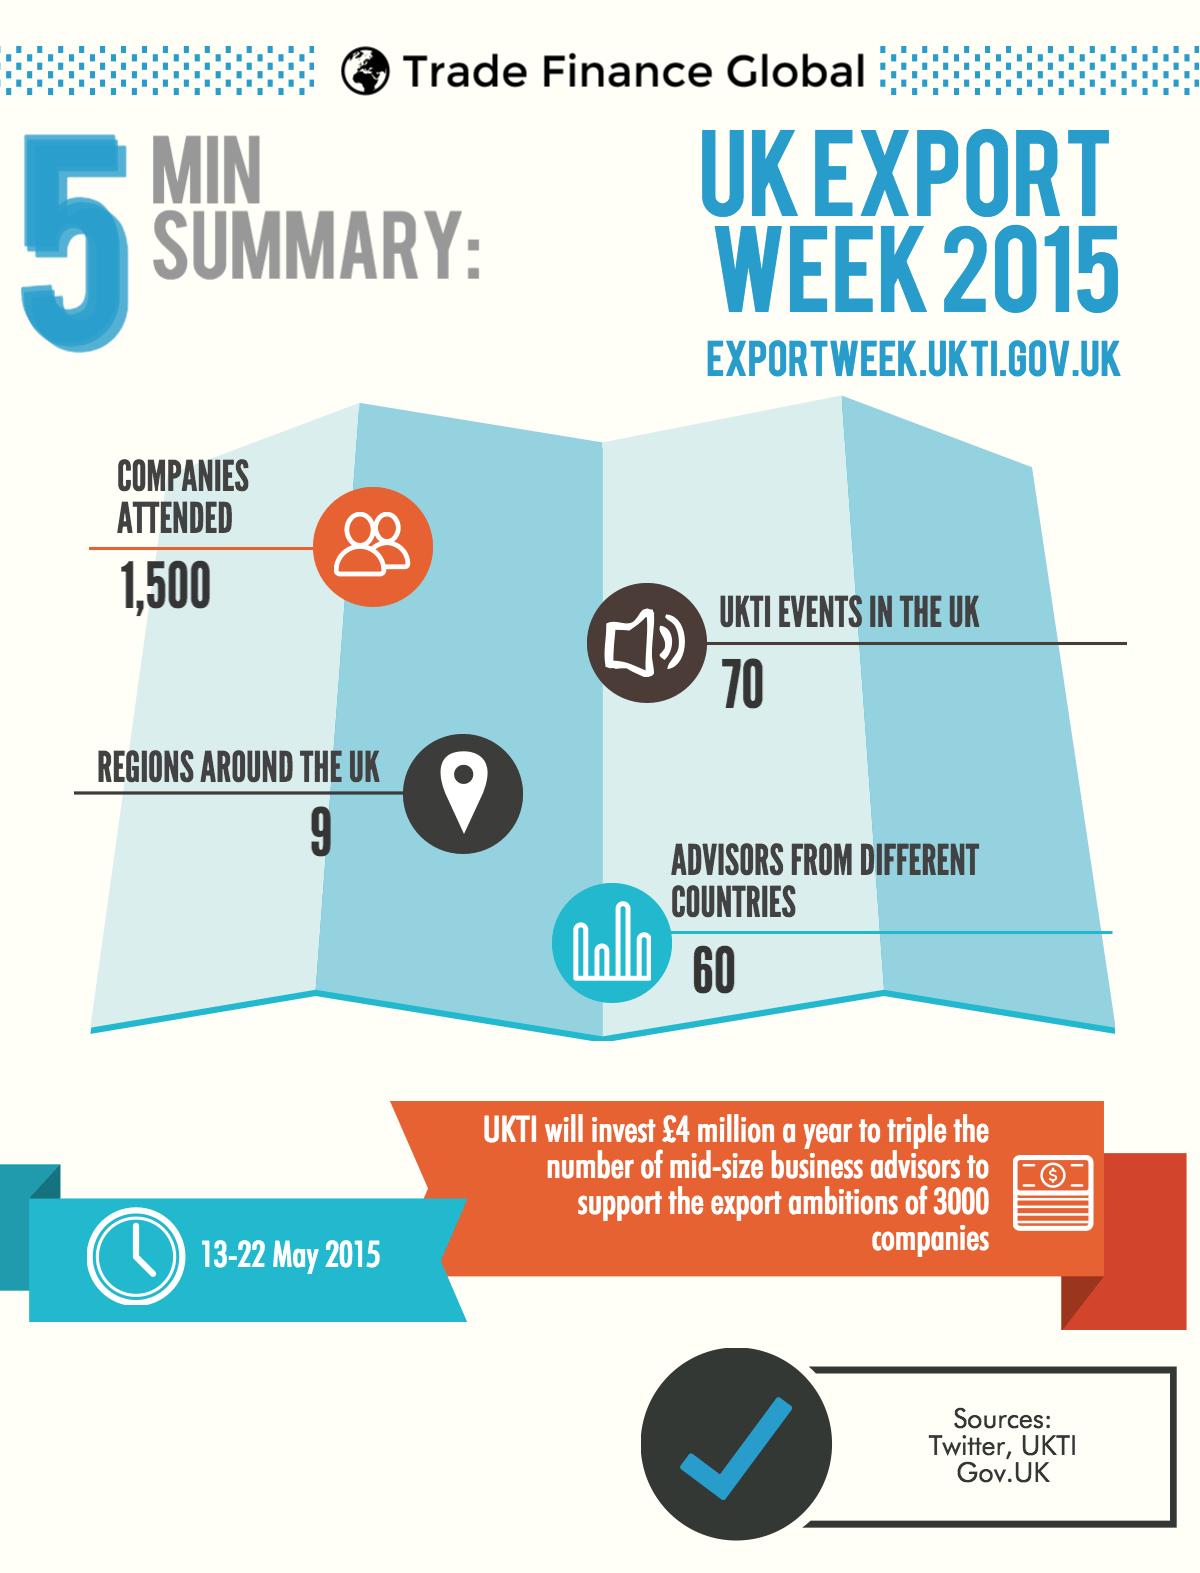 UK Brief Summary #exportweek